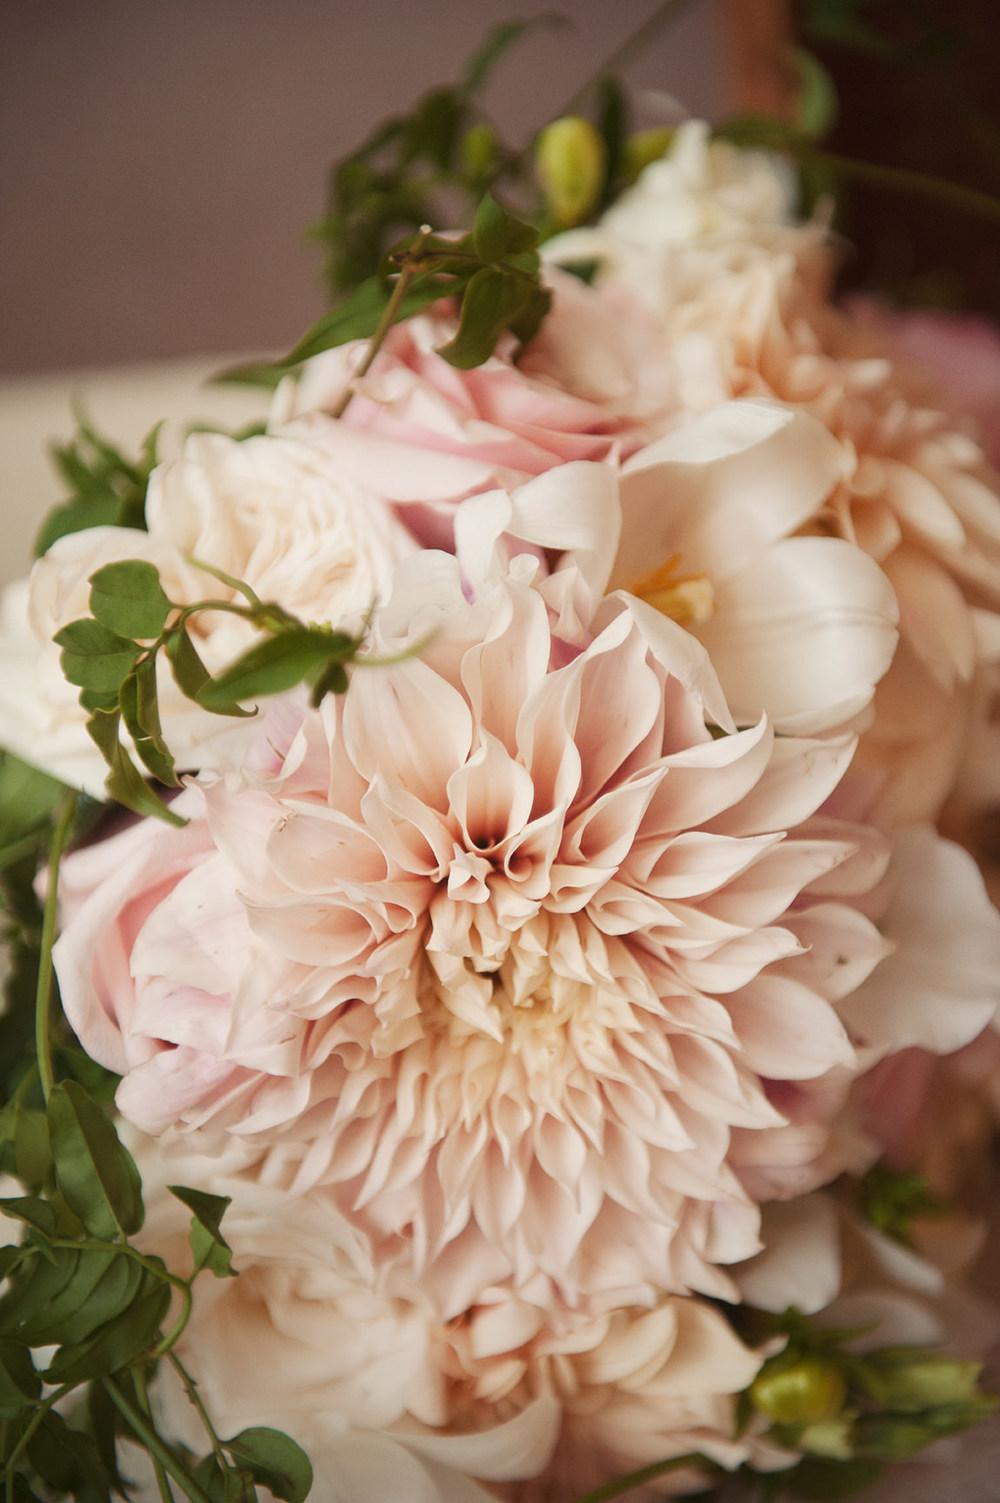 St-Catharines-Wedding-Stone-Mill-Inn-Amy-Darryl-photography-by-Morgan-Falk-100.JPG